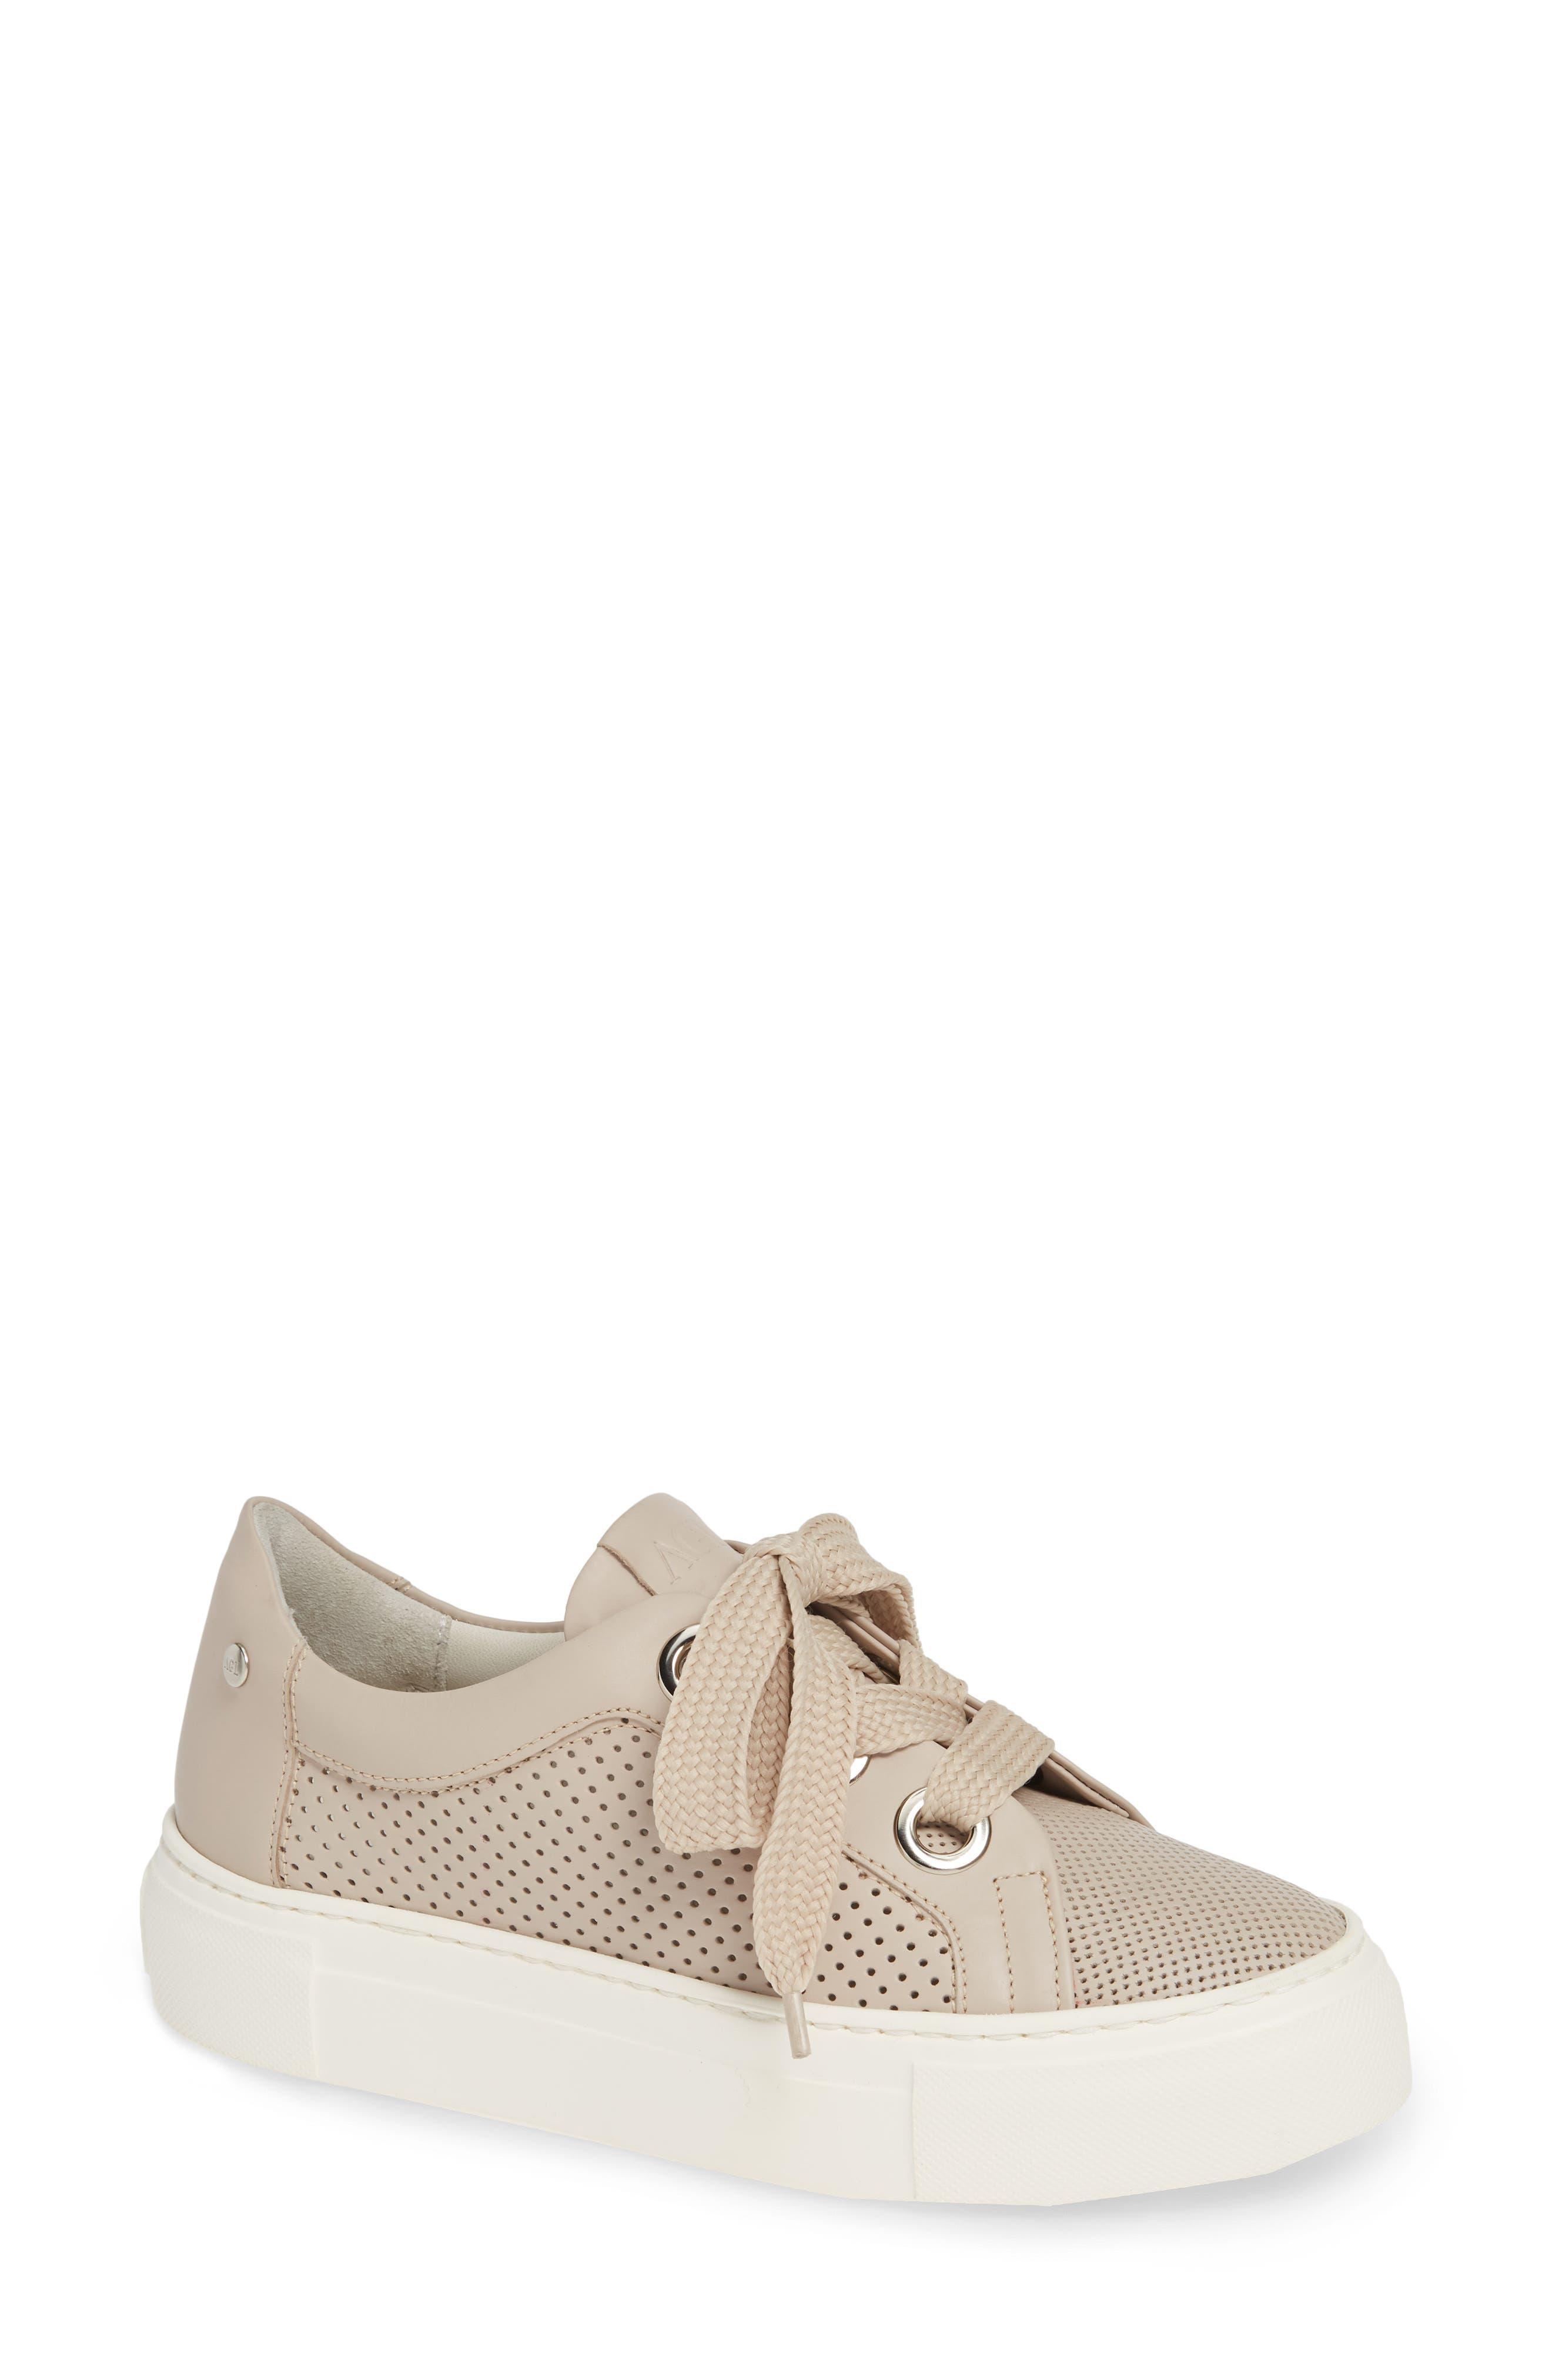 Agl Perforated Platform Sneaker, Beige